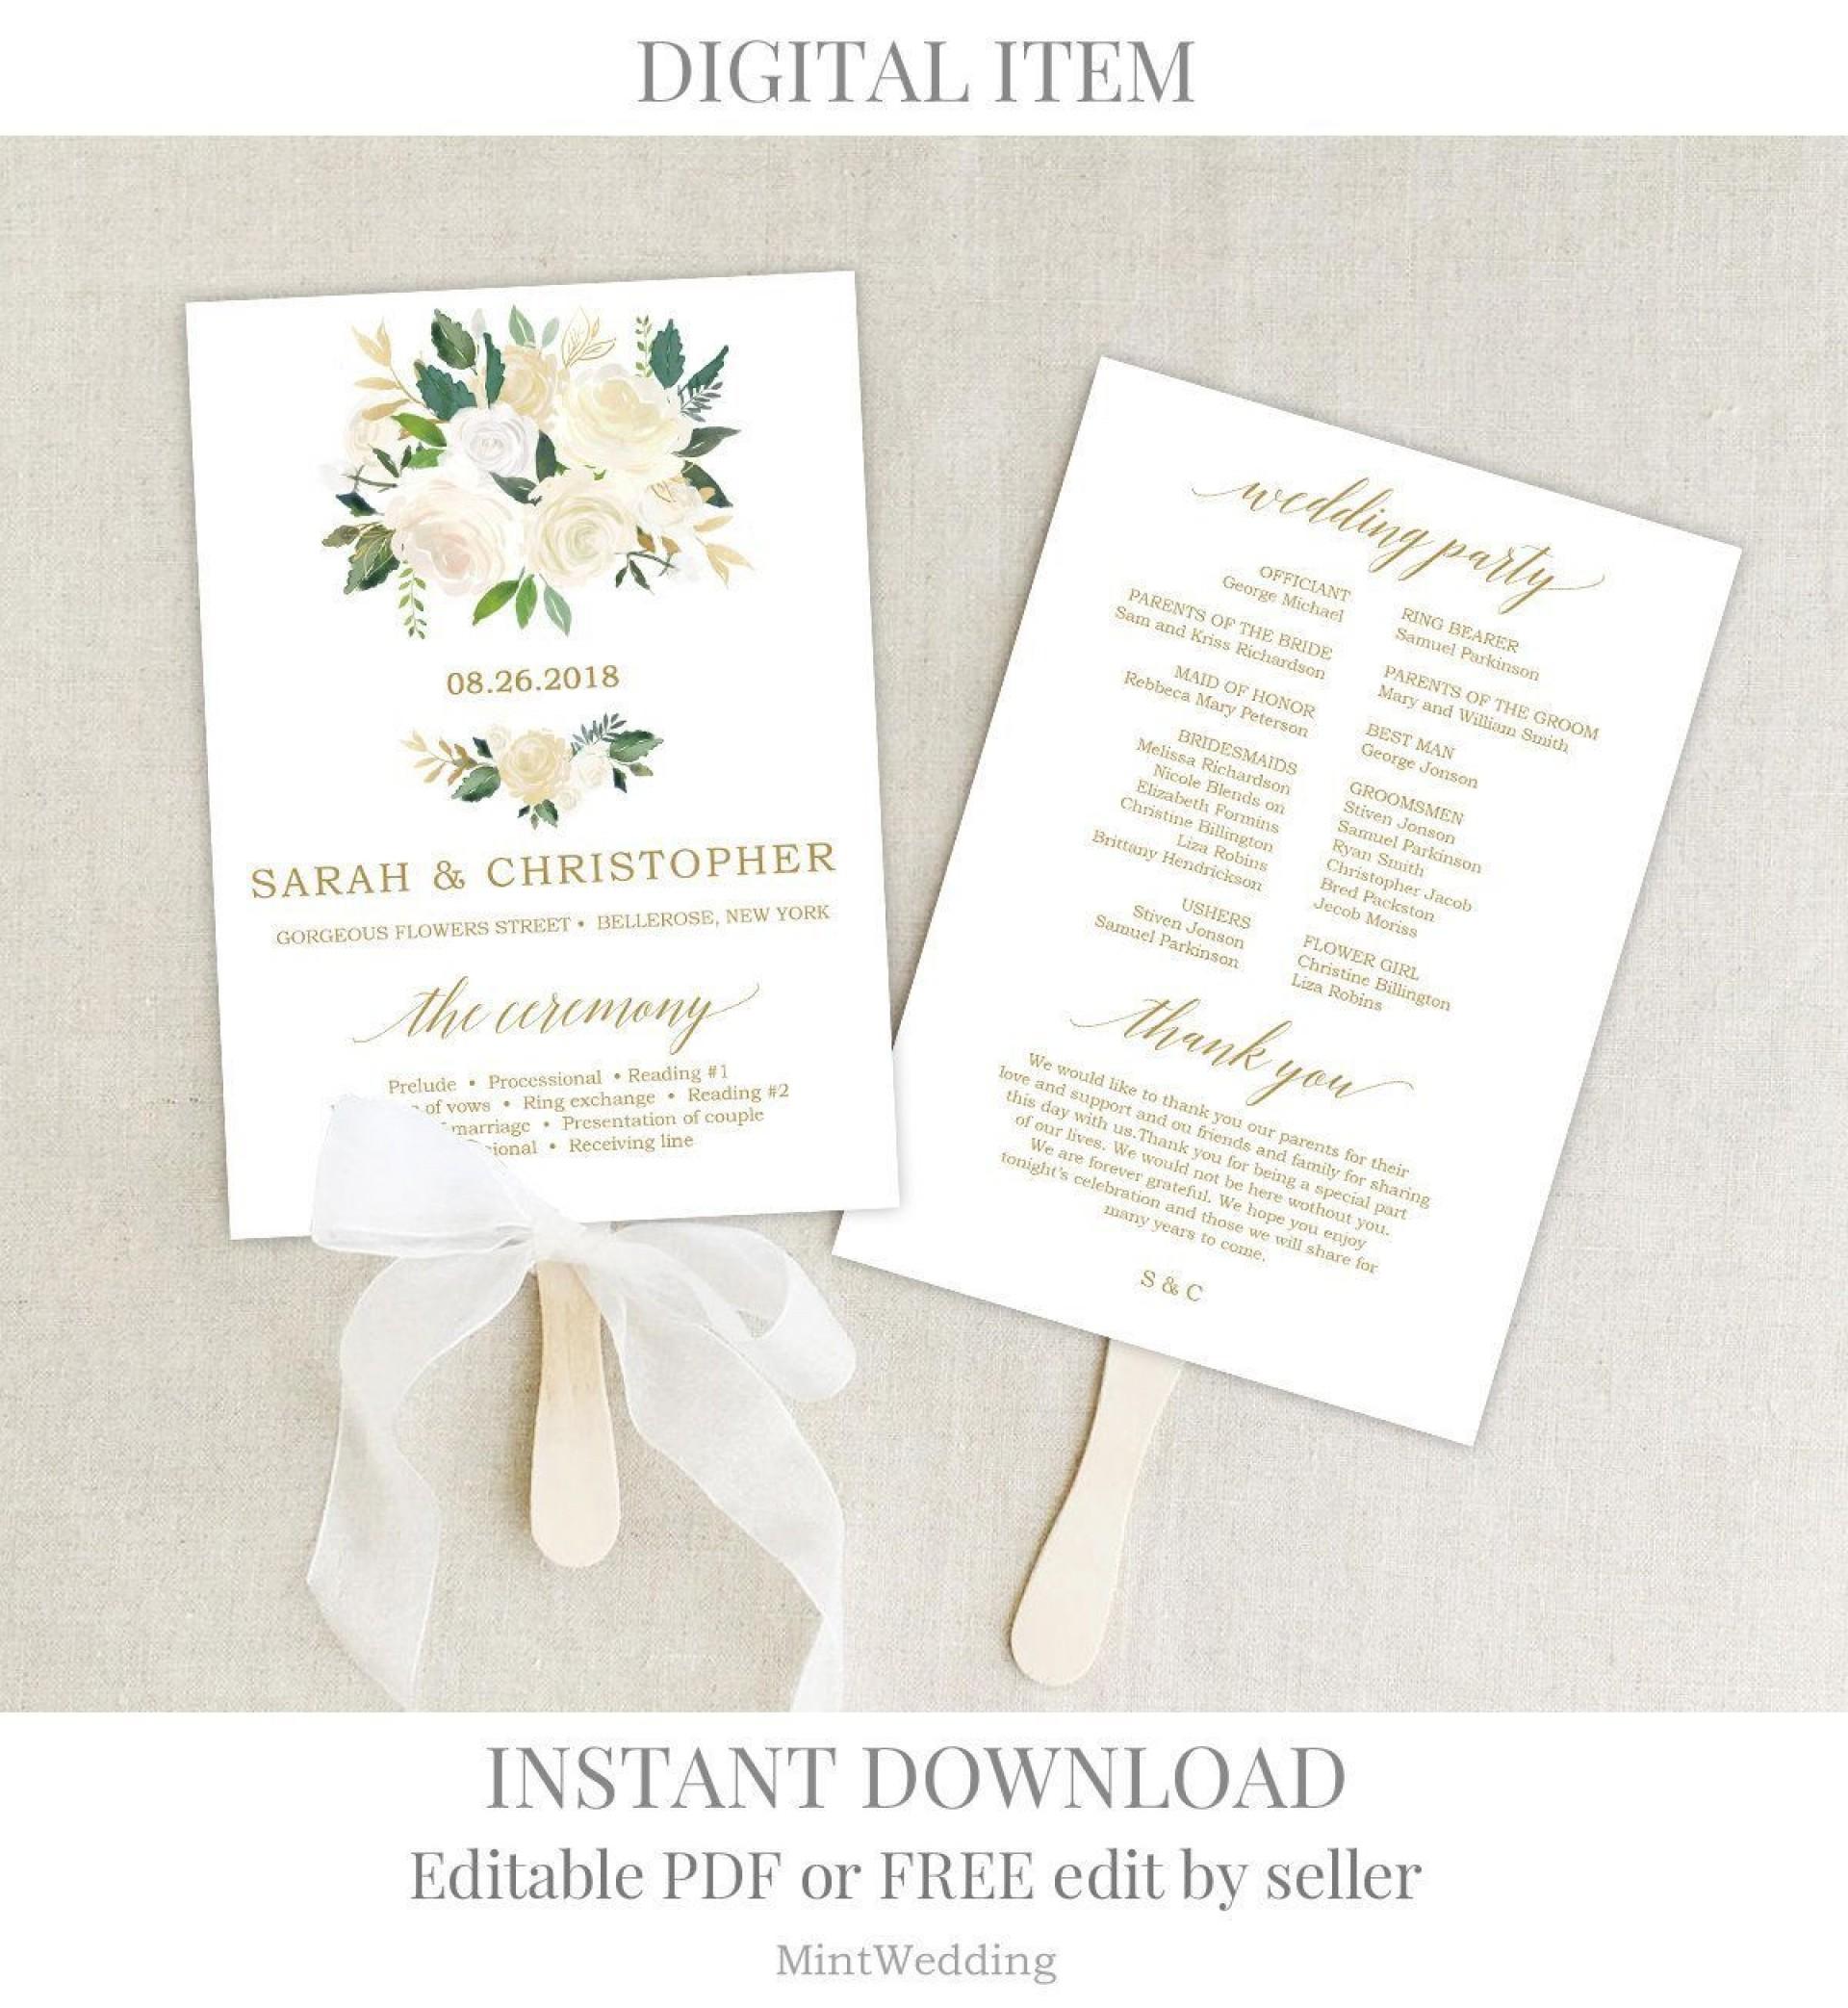 002 Sensational Free Printable Wedding Program Template Inspiration  Templates Microsoft Word Indian1920